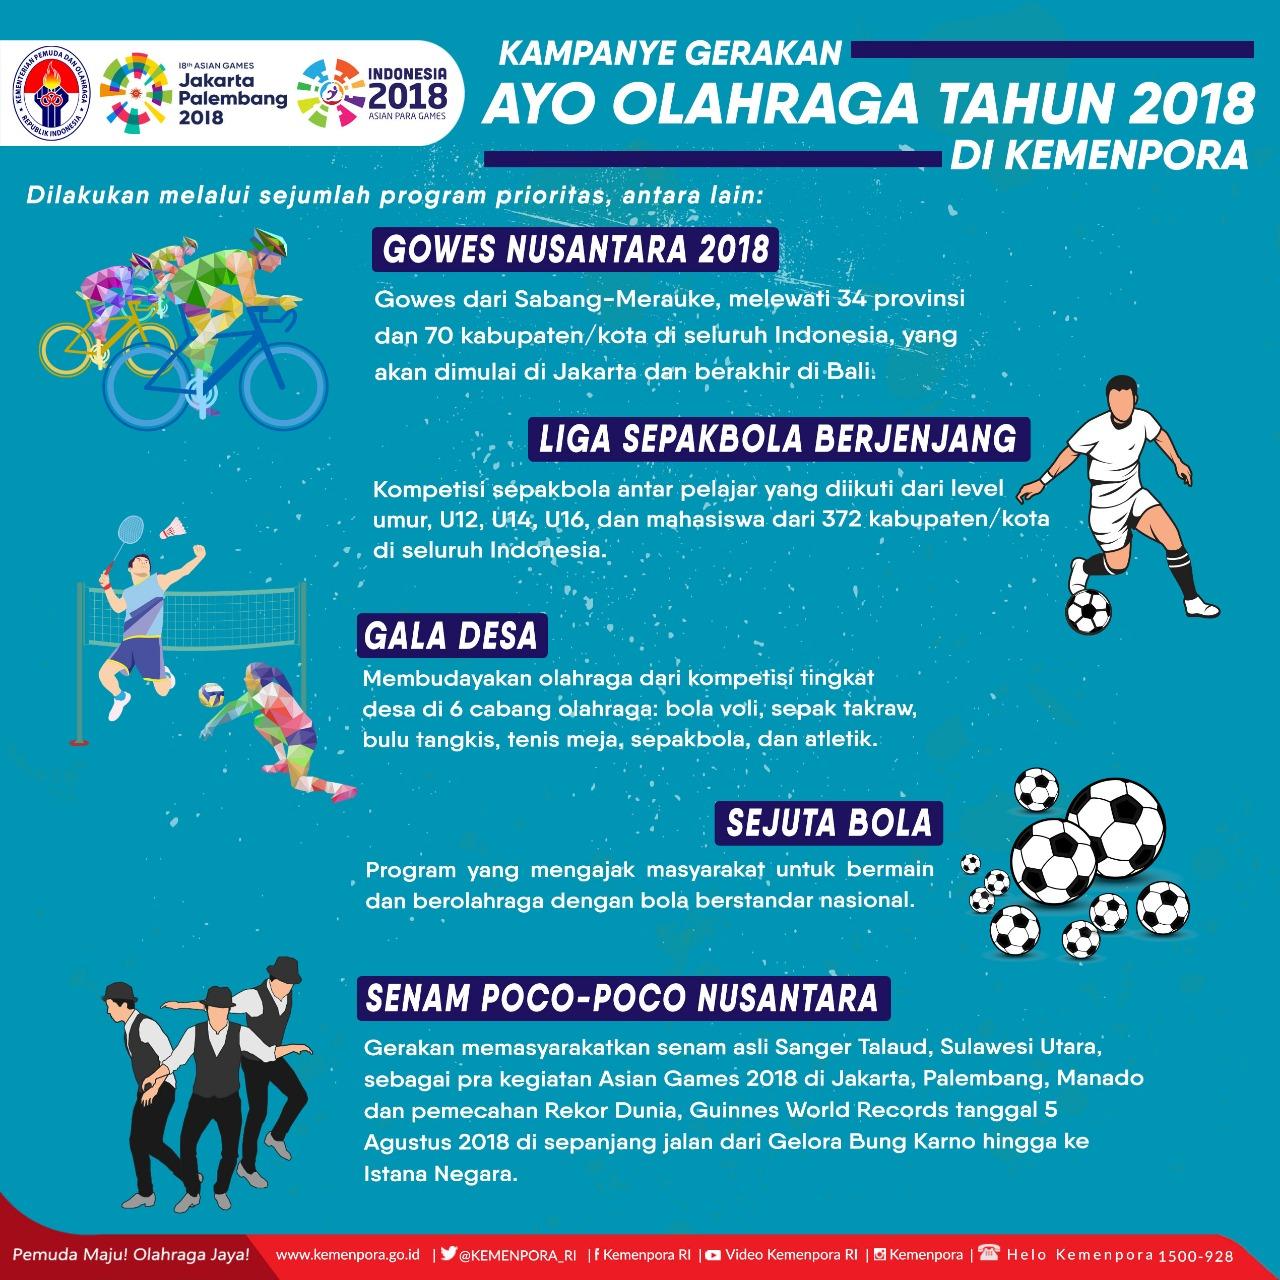 Kampanye Gerakan Ayo Olahraga